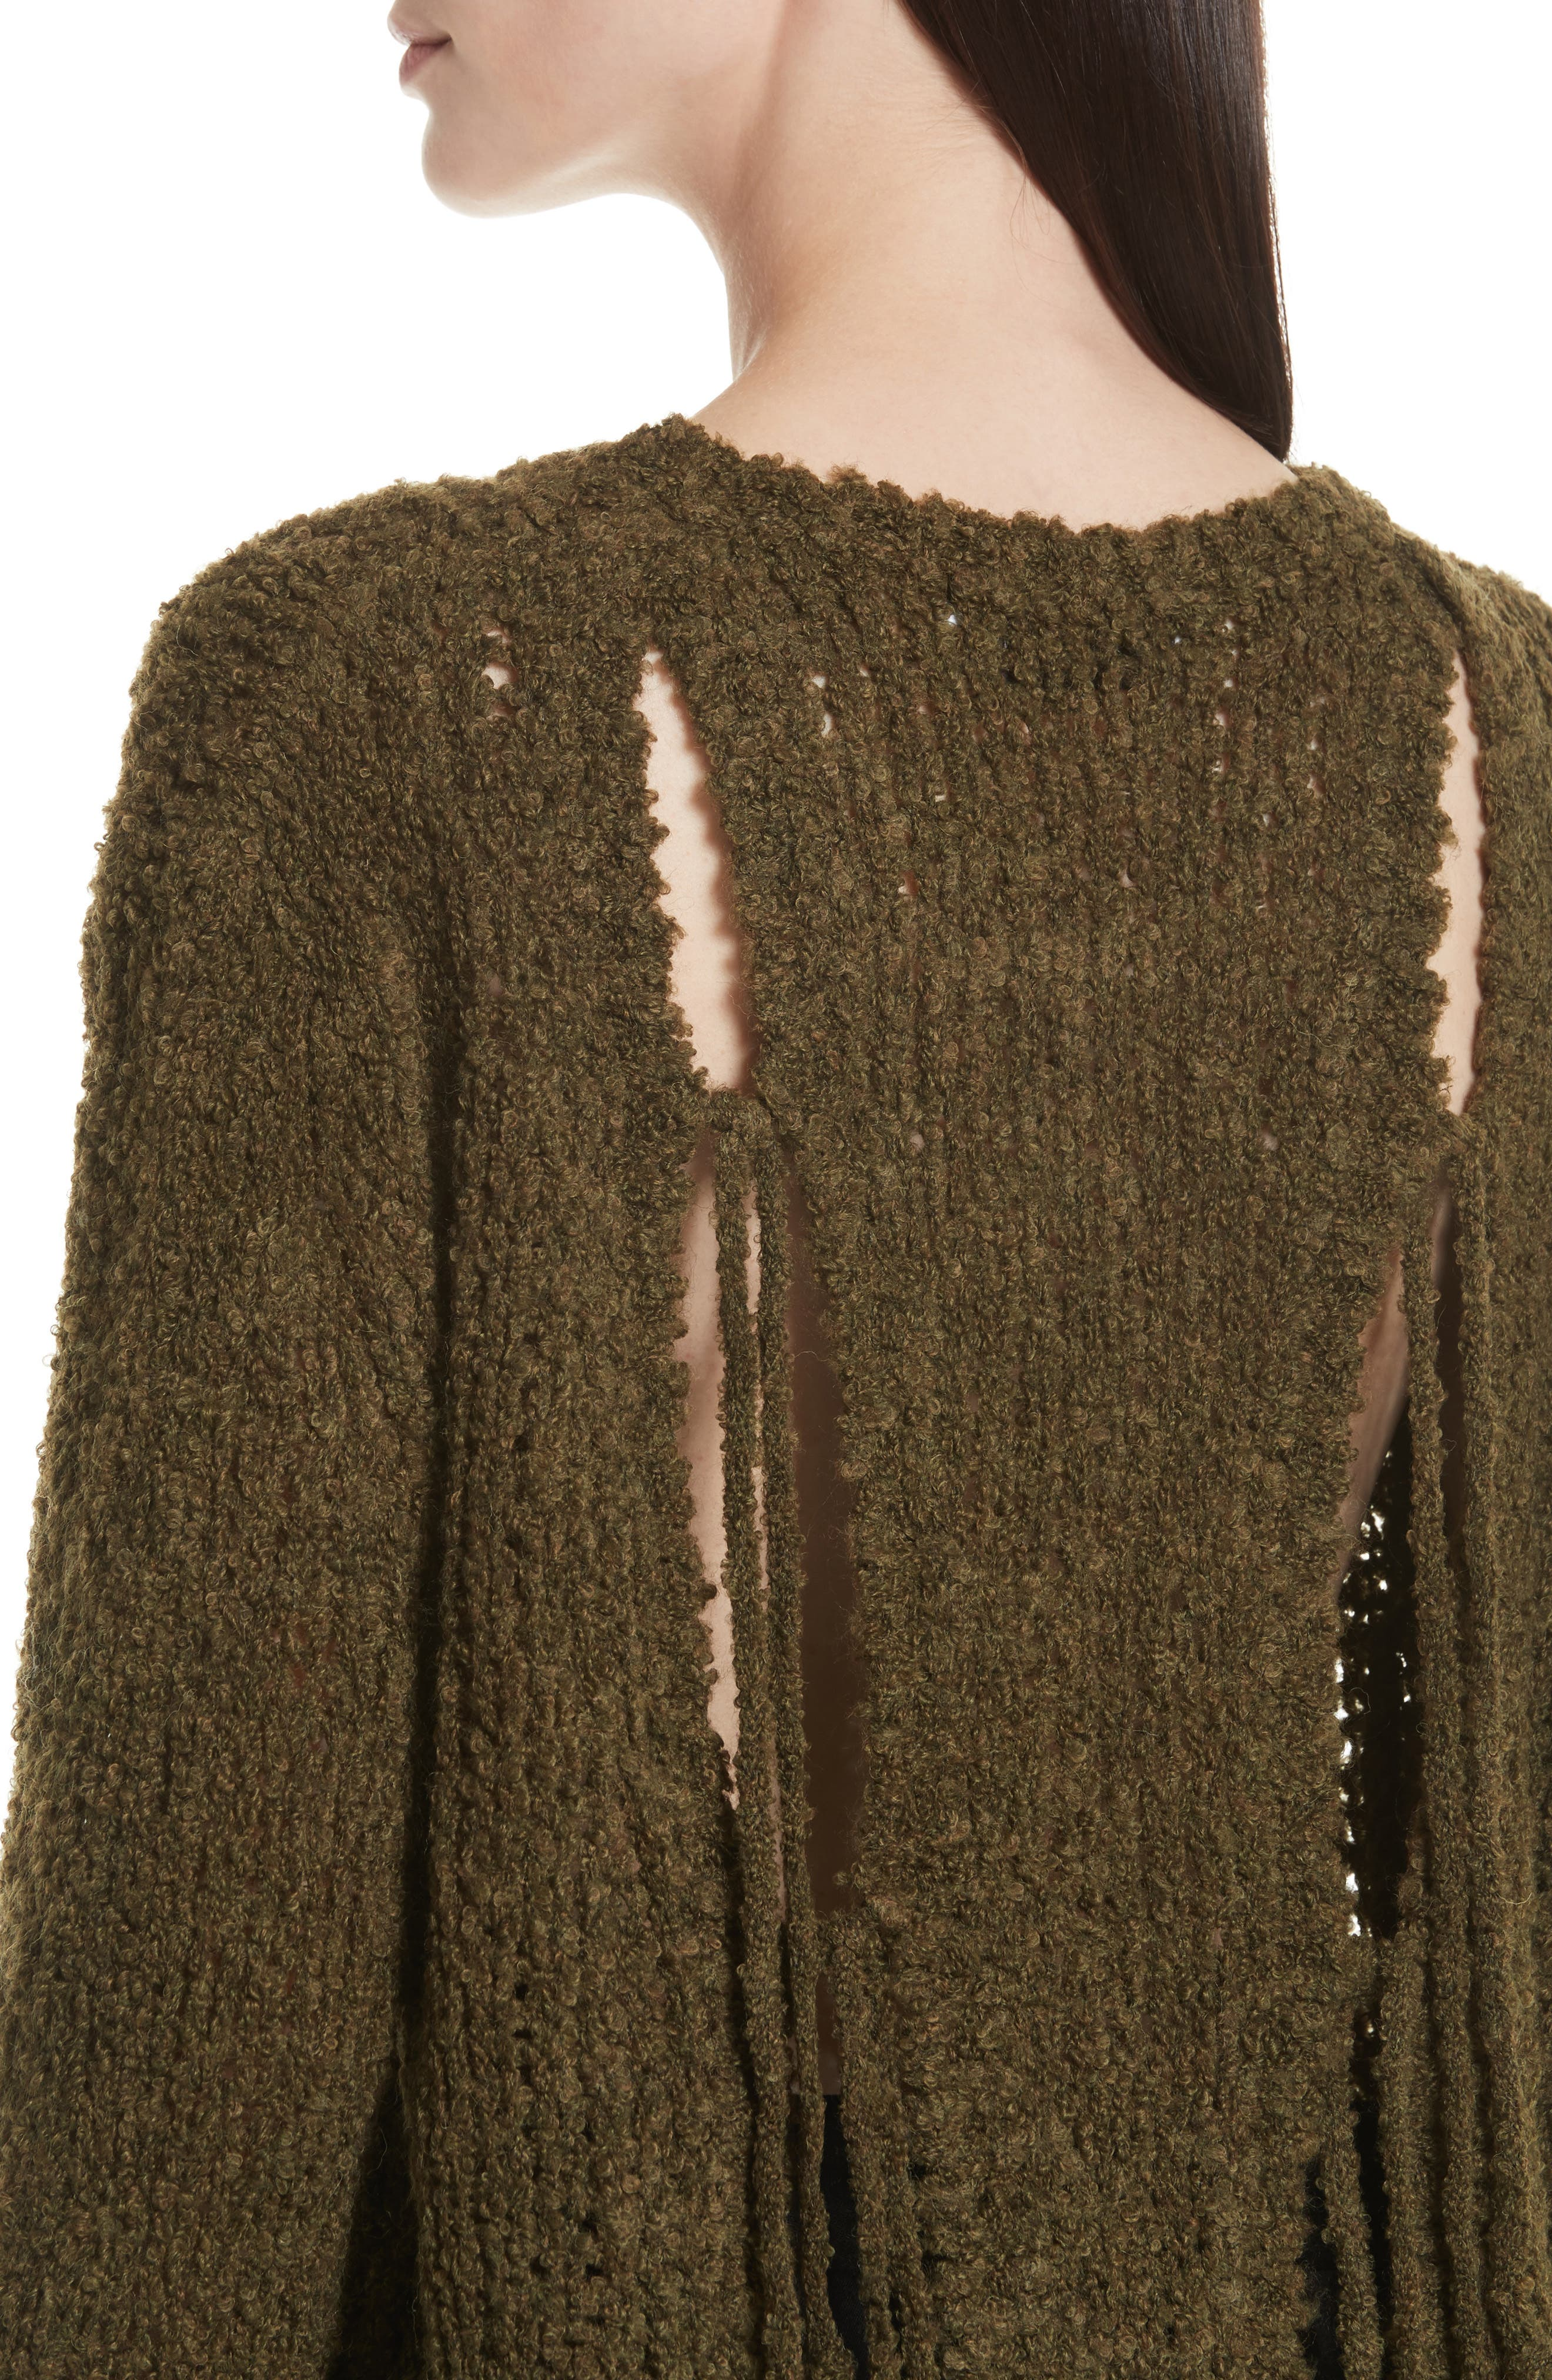 Cresent Cutout Sweater,                             Alternate thumbnail 4, color,                             300